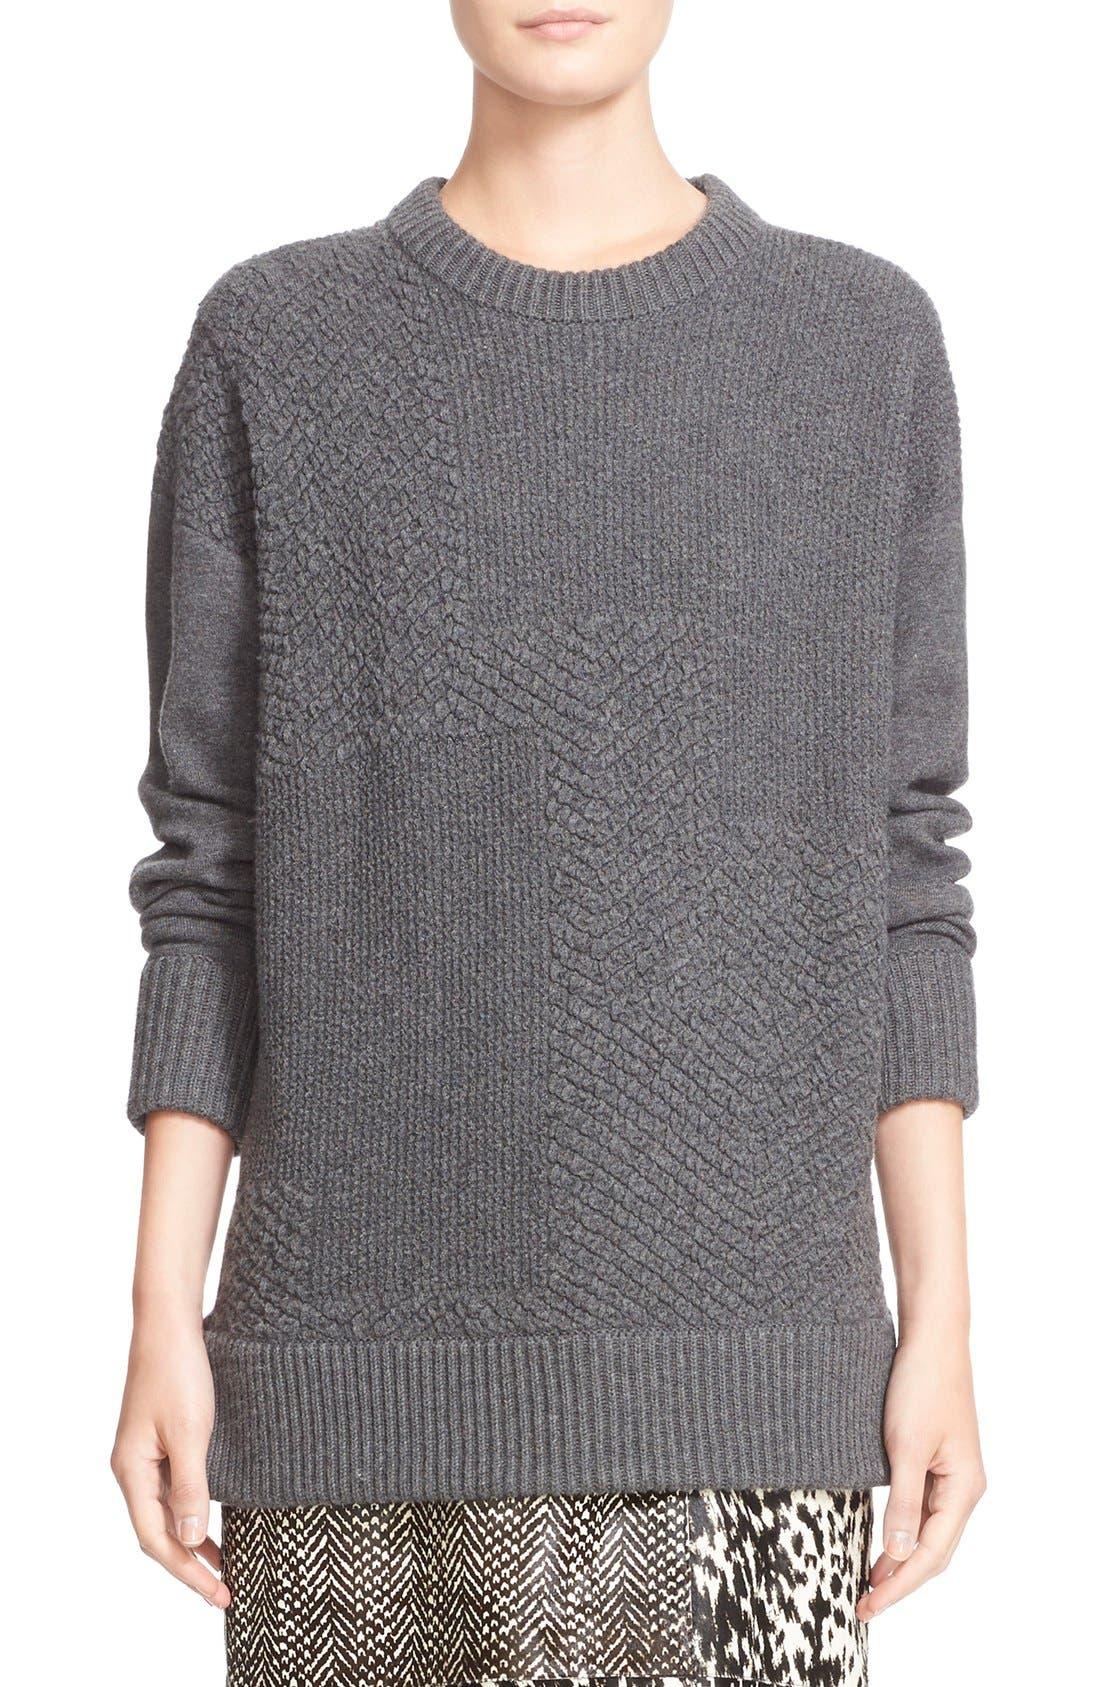 Main Image - Jason Wu Cashmere & Wool Blend Textured Sweater